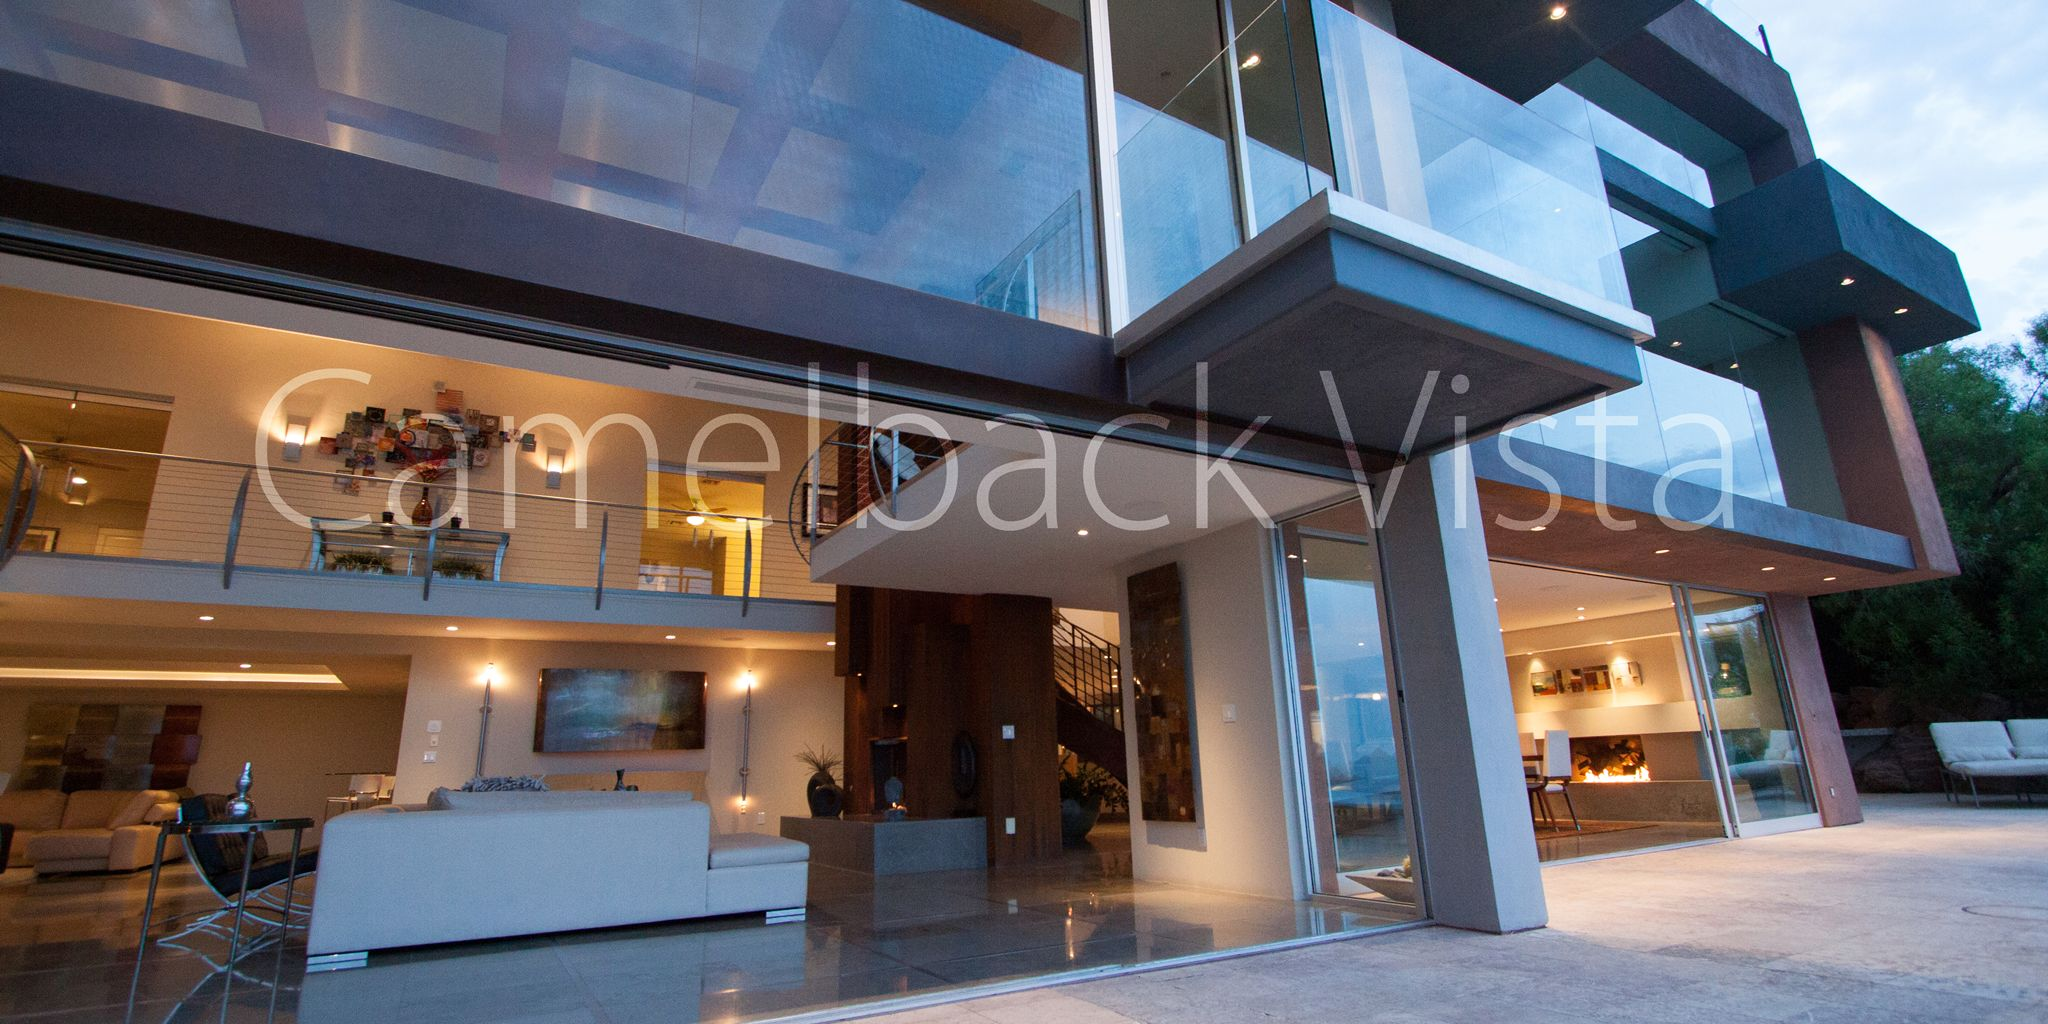 Camelback Vista in Phoenix Arizona  Villa  Estate Deals